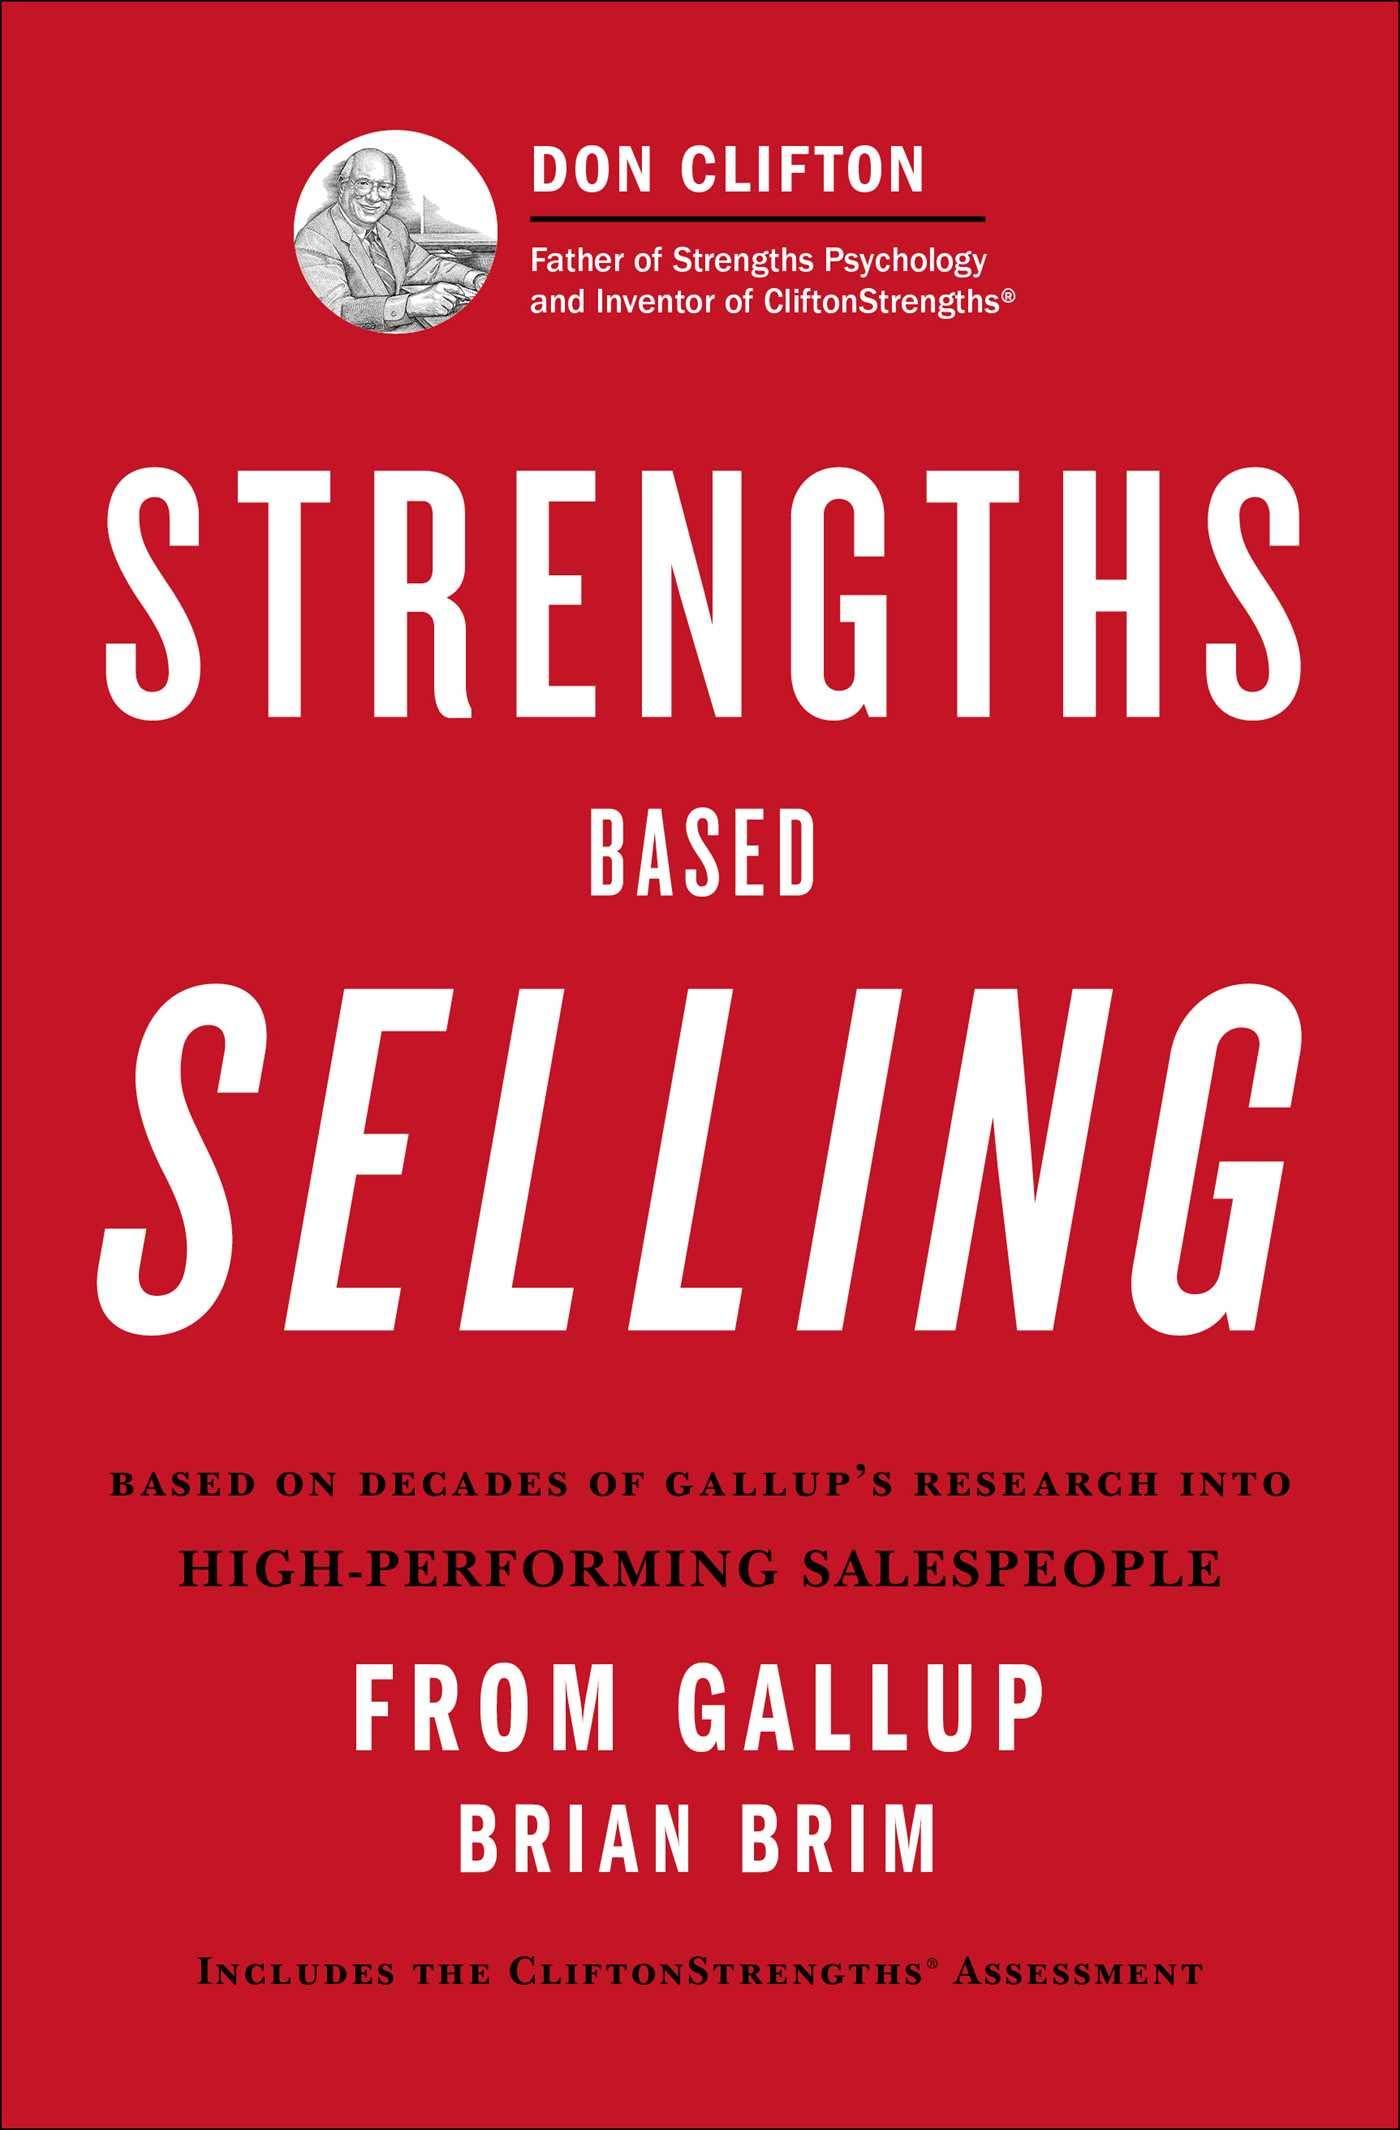 Strengths Based Selling